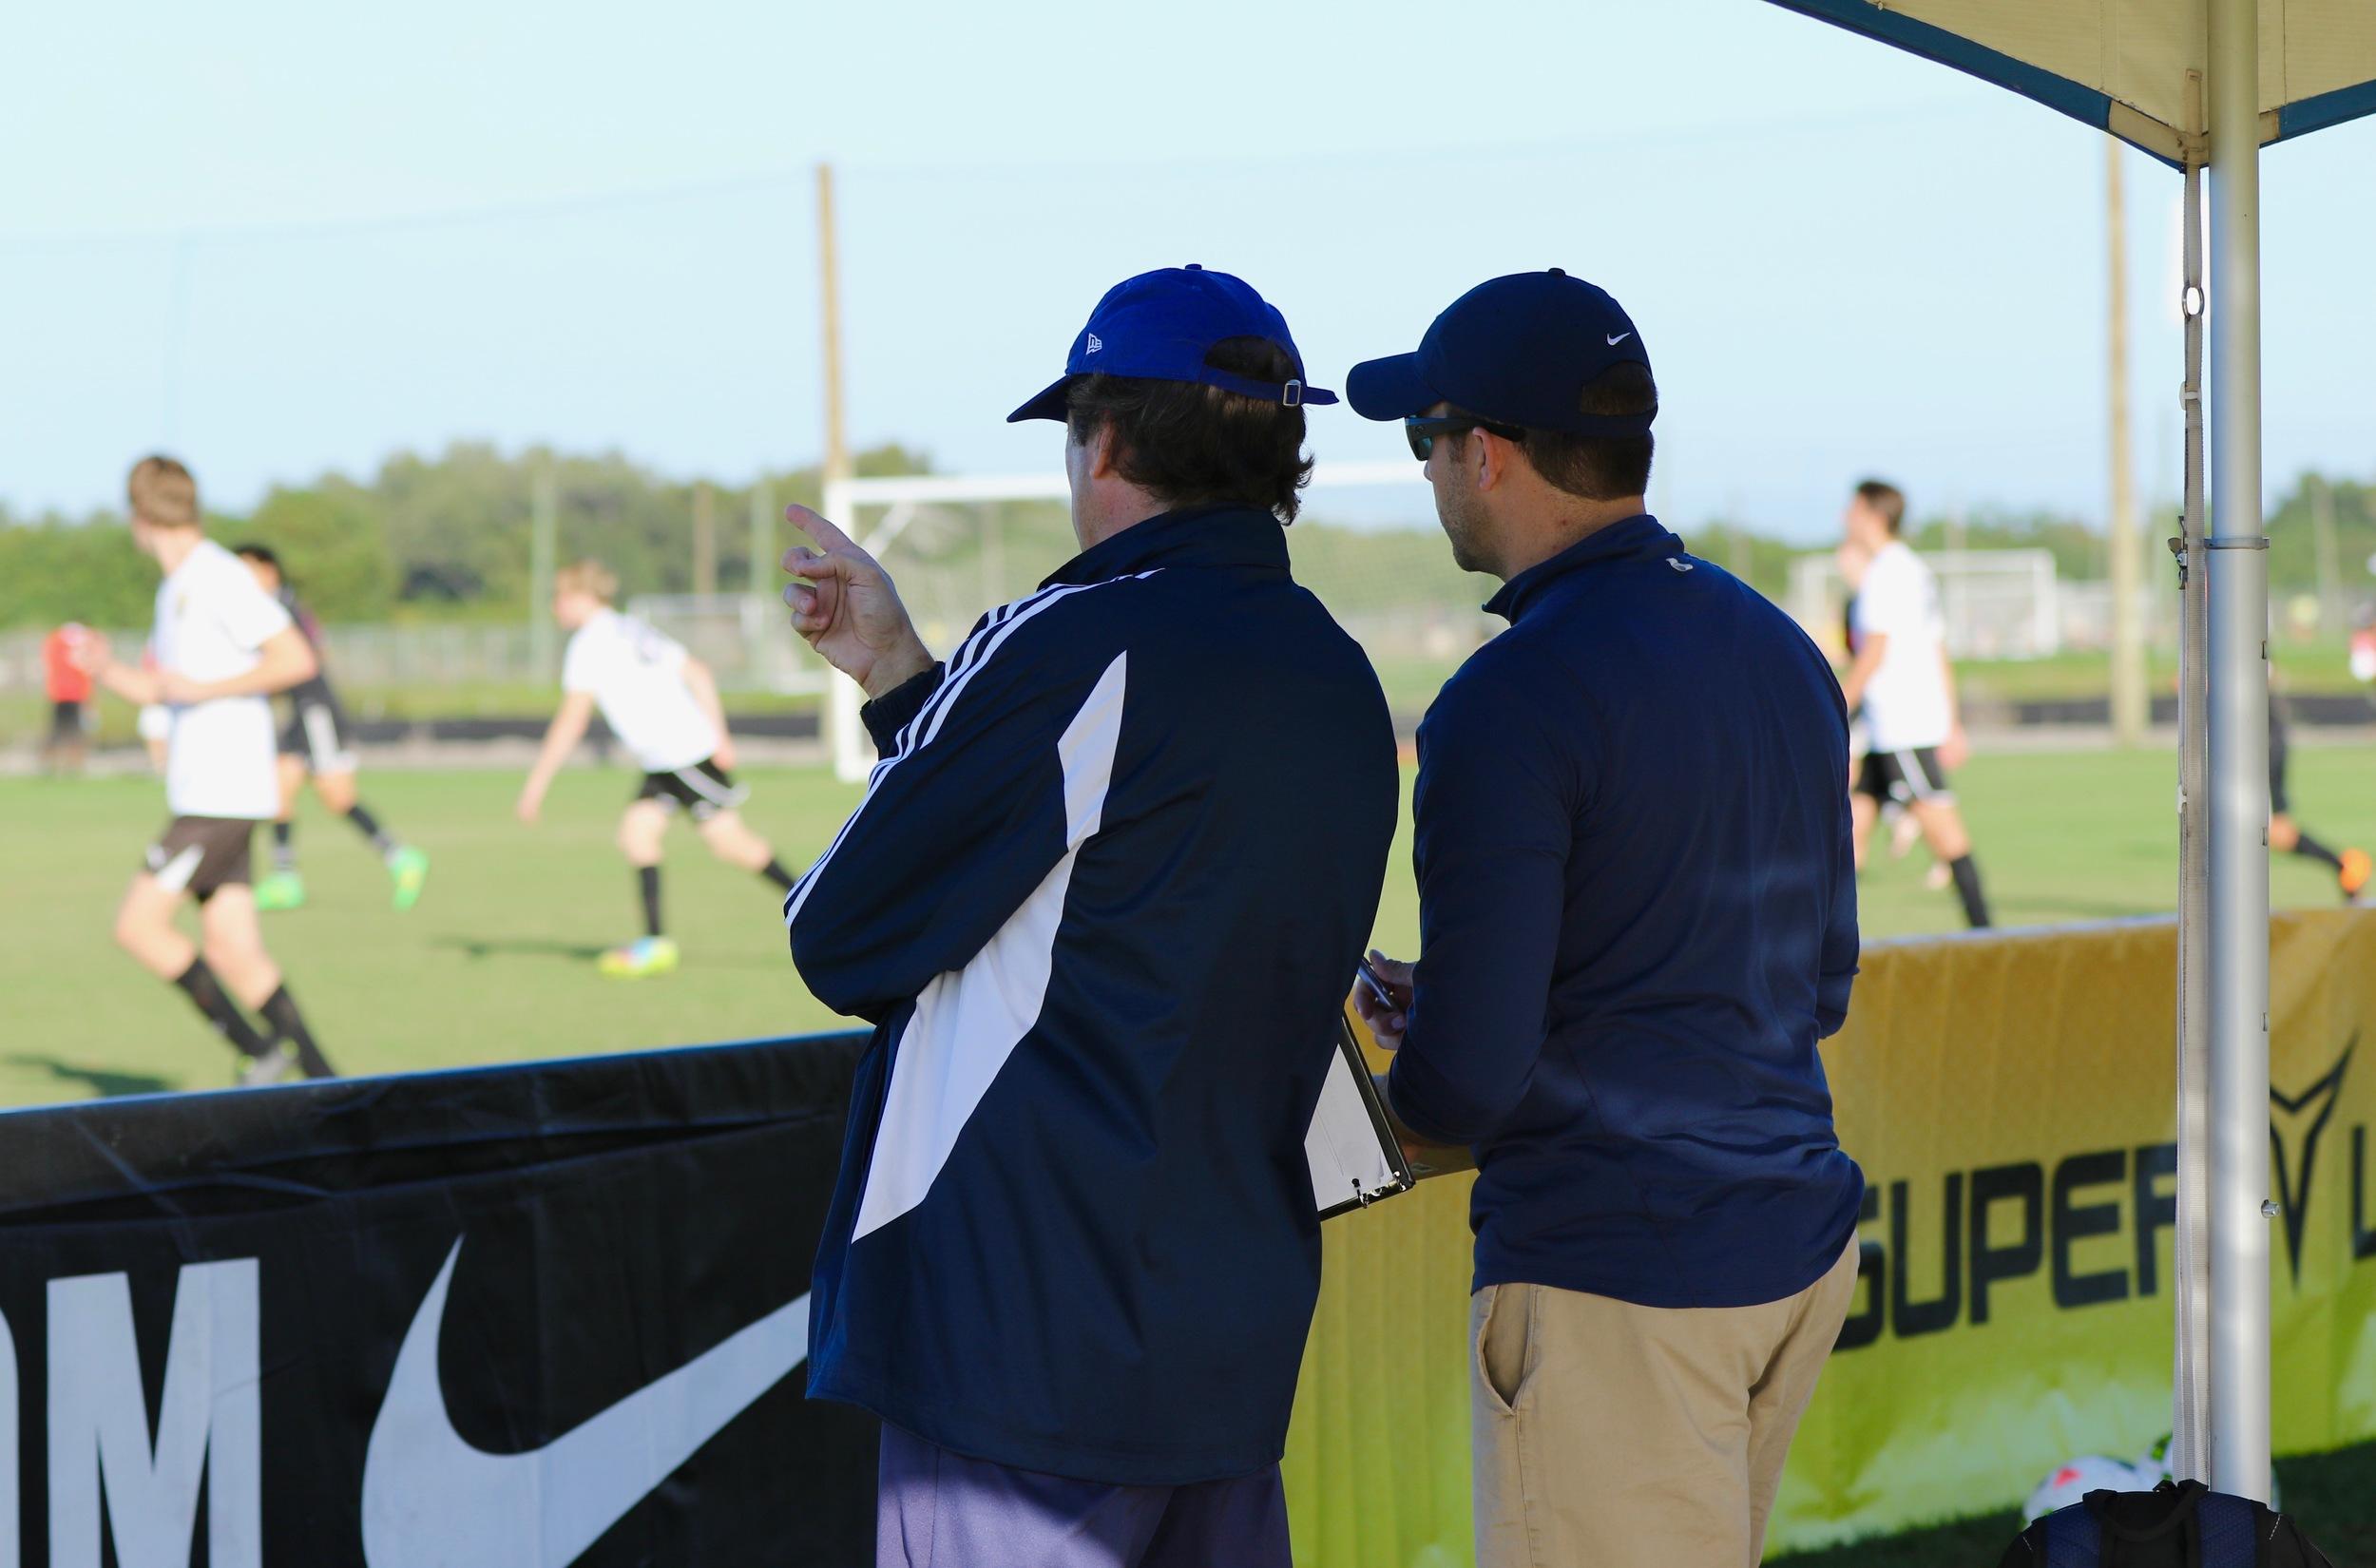 Scouting U16, U14, U13, U12 players at the Super Y league National Championship.